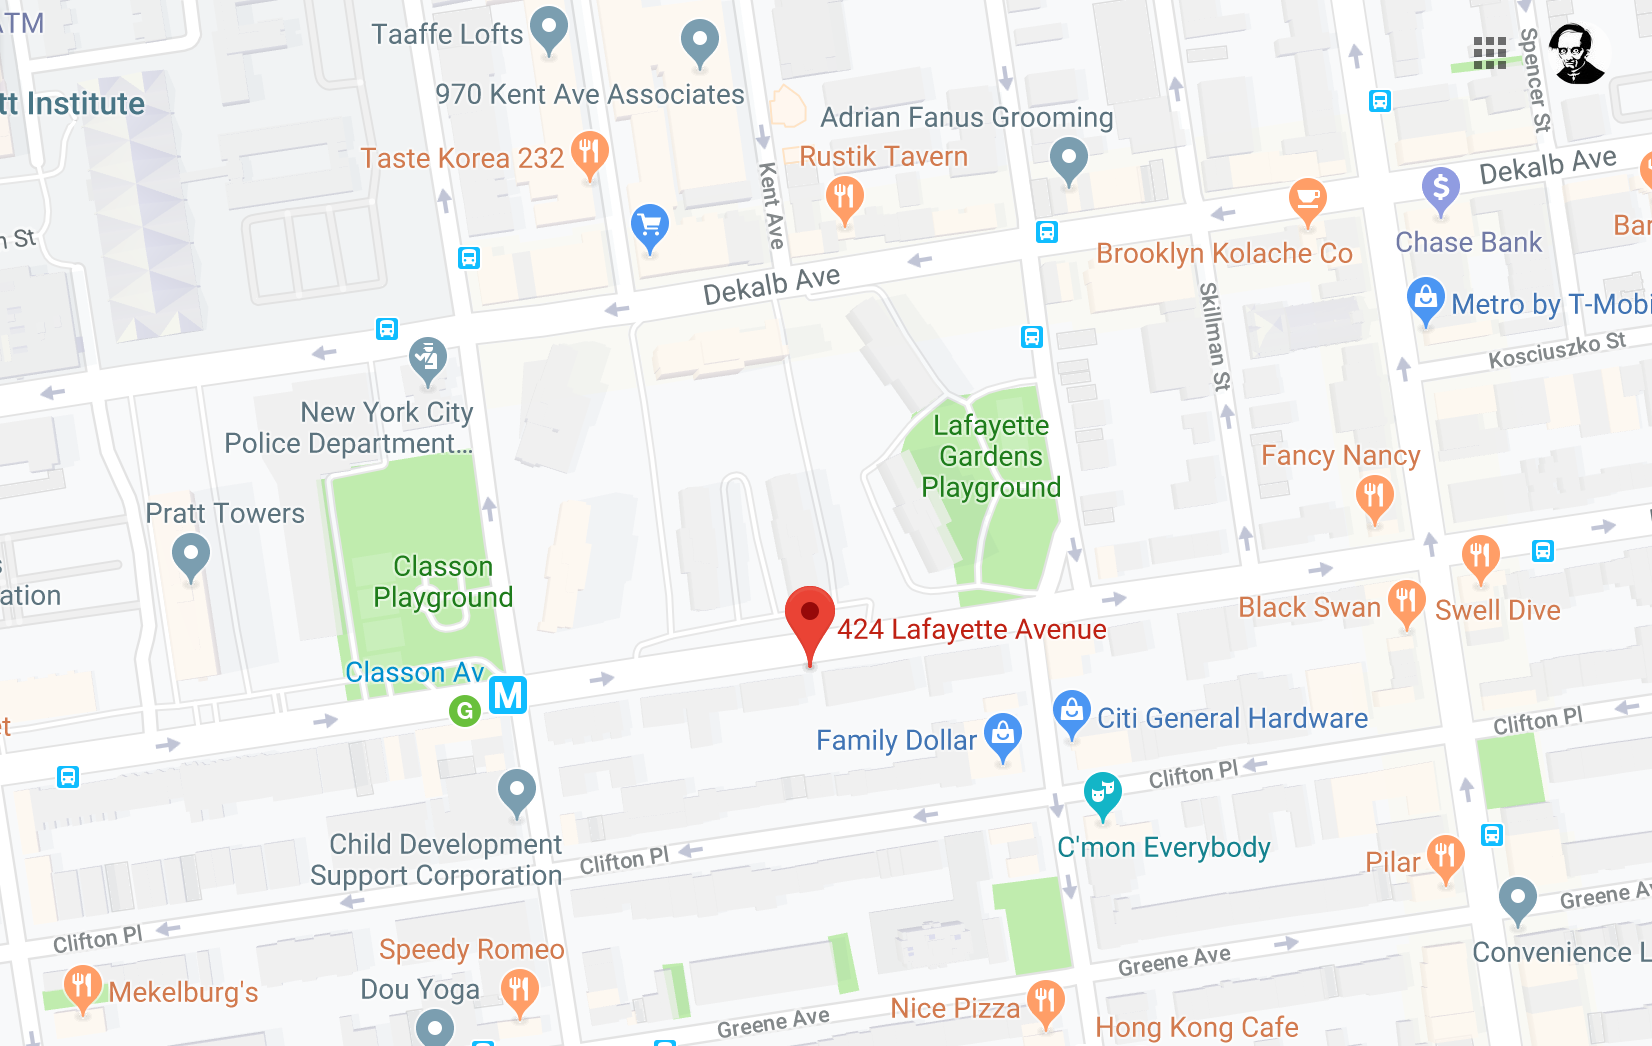 32 varet street map.png